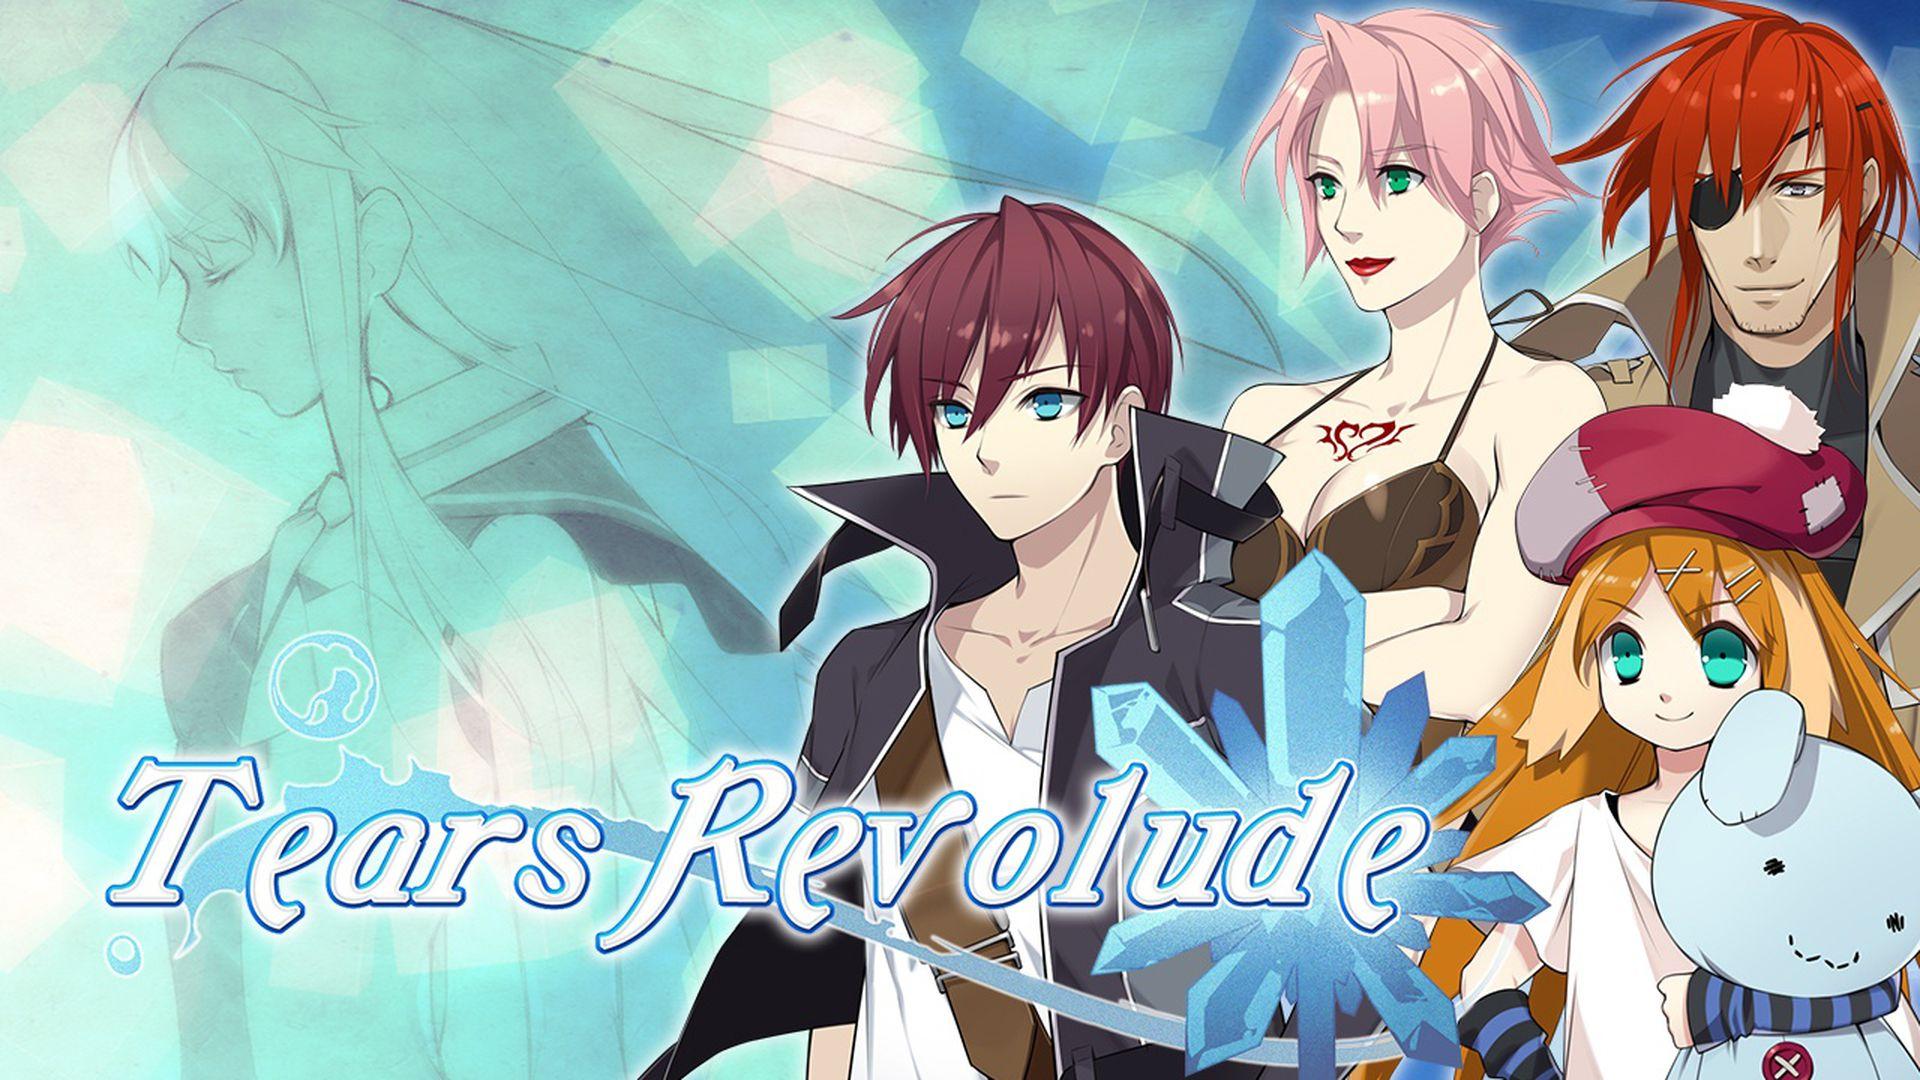 Tears Revolude